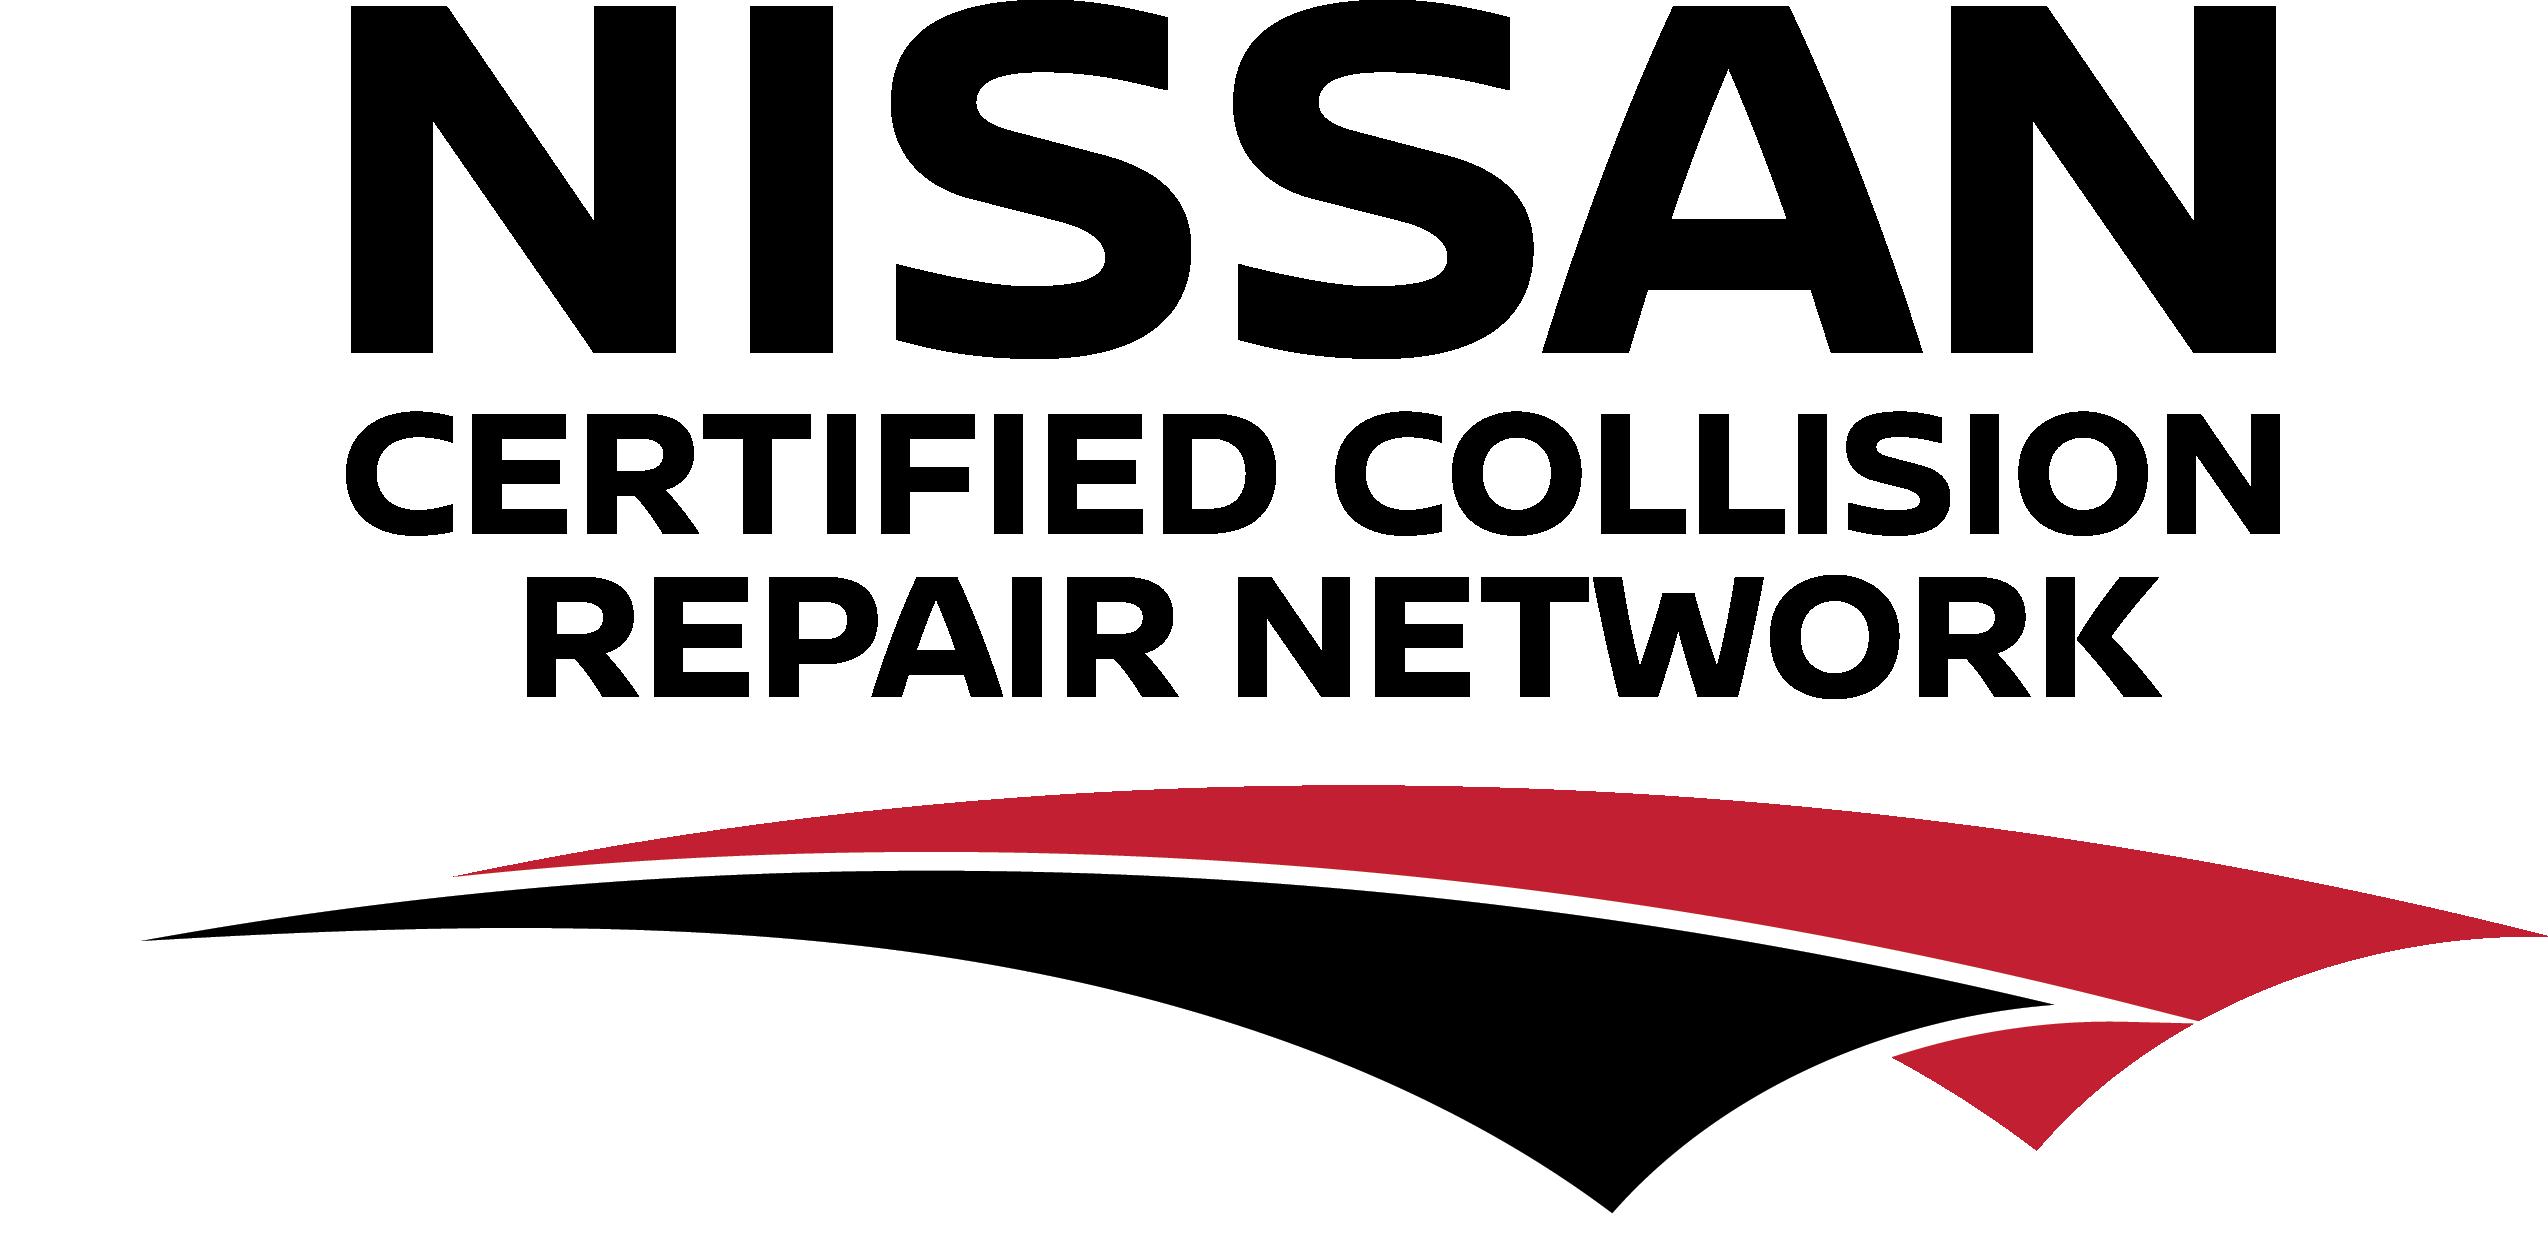 https://weeheart.com/wp-content/uploads/2020/11/thumbnail_Nissan-CRN-Logo_BLK-1.png